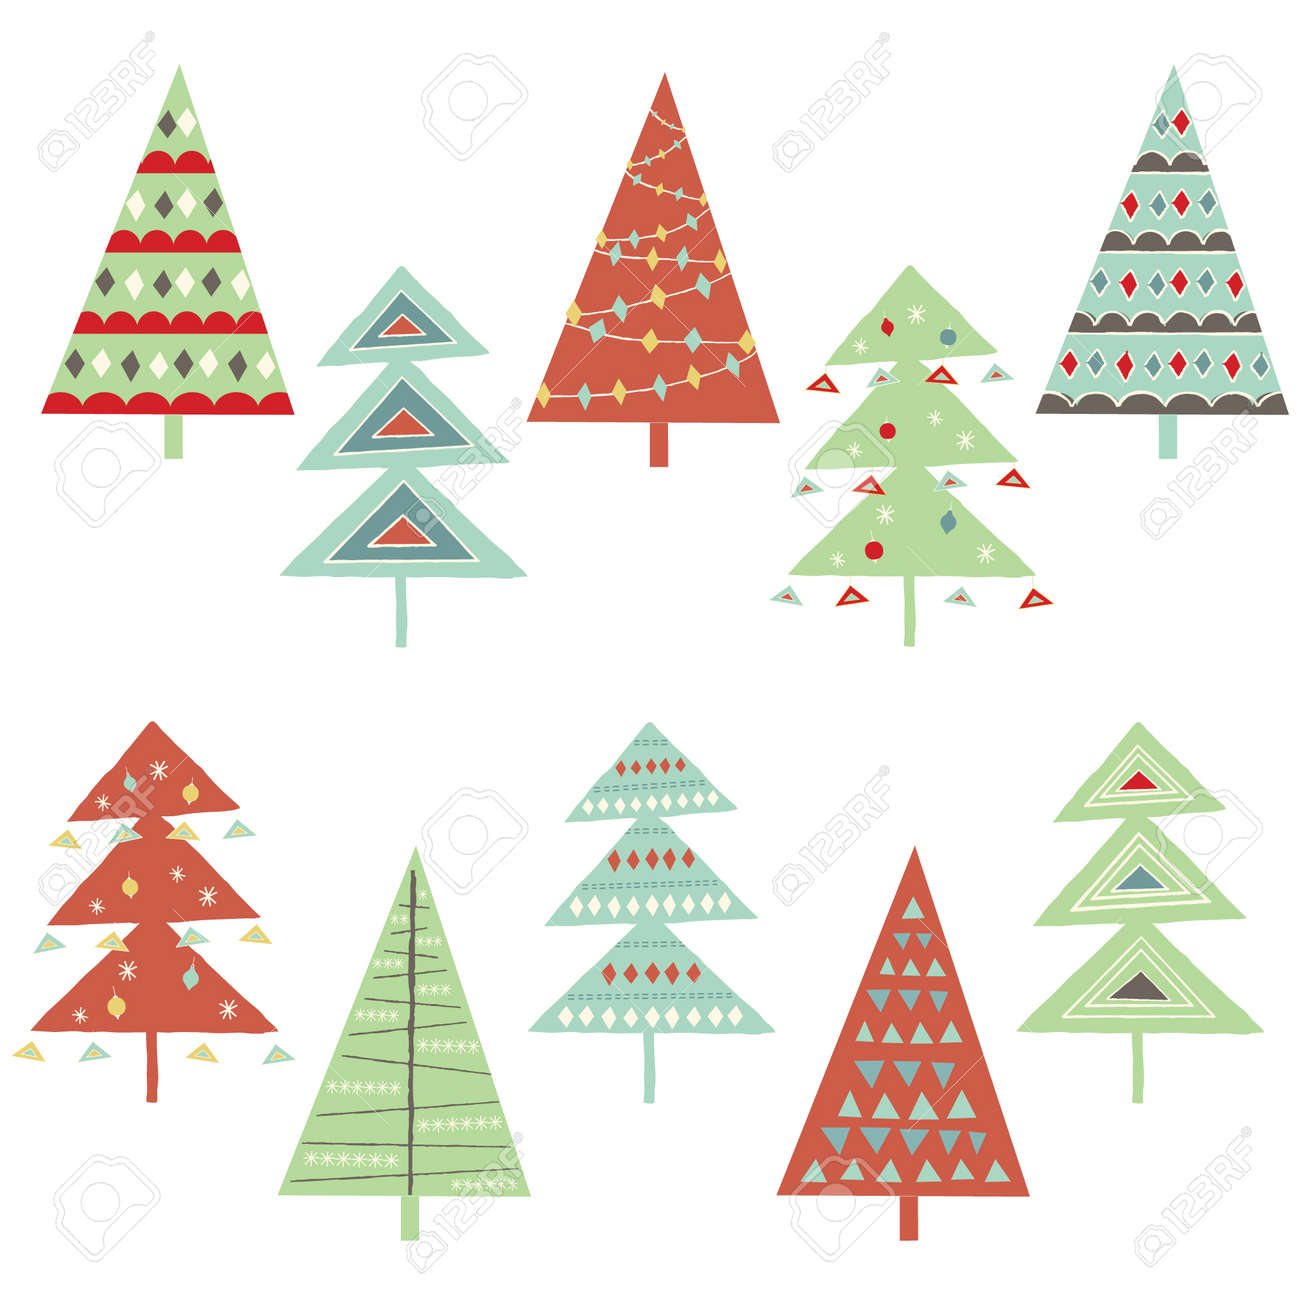 Christmas Trees Background Clipart.Christmas Tree Set On White Background Vector Illustration